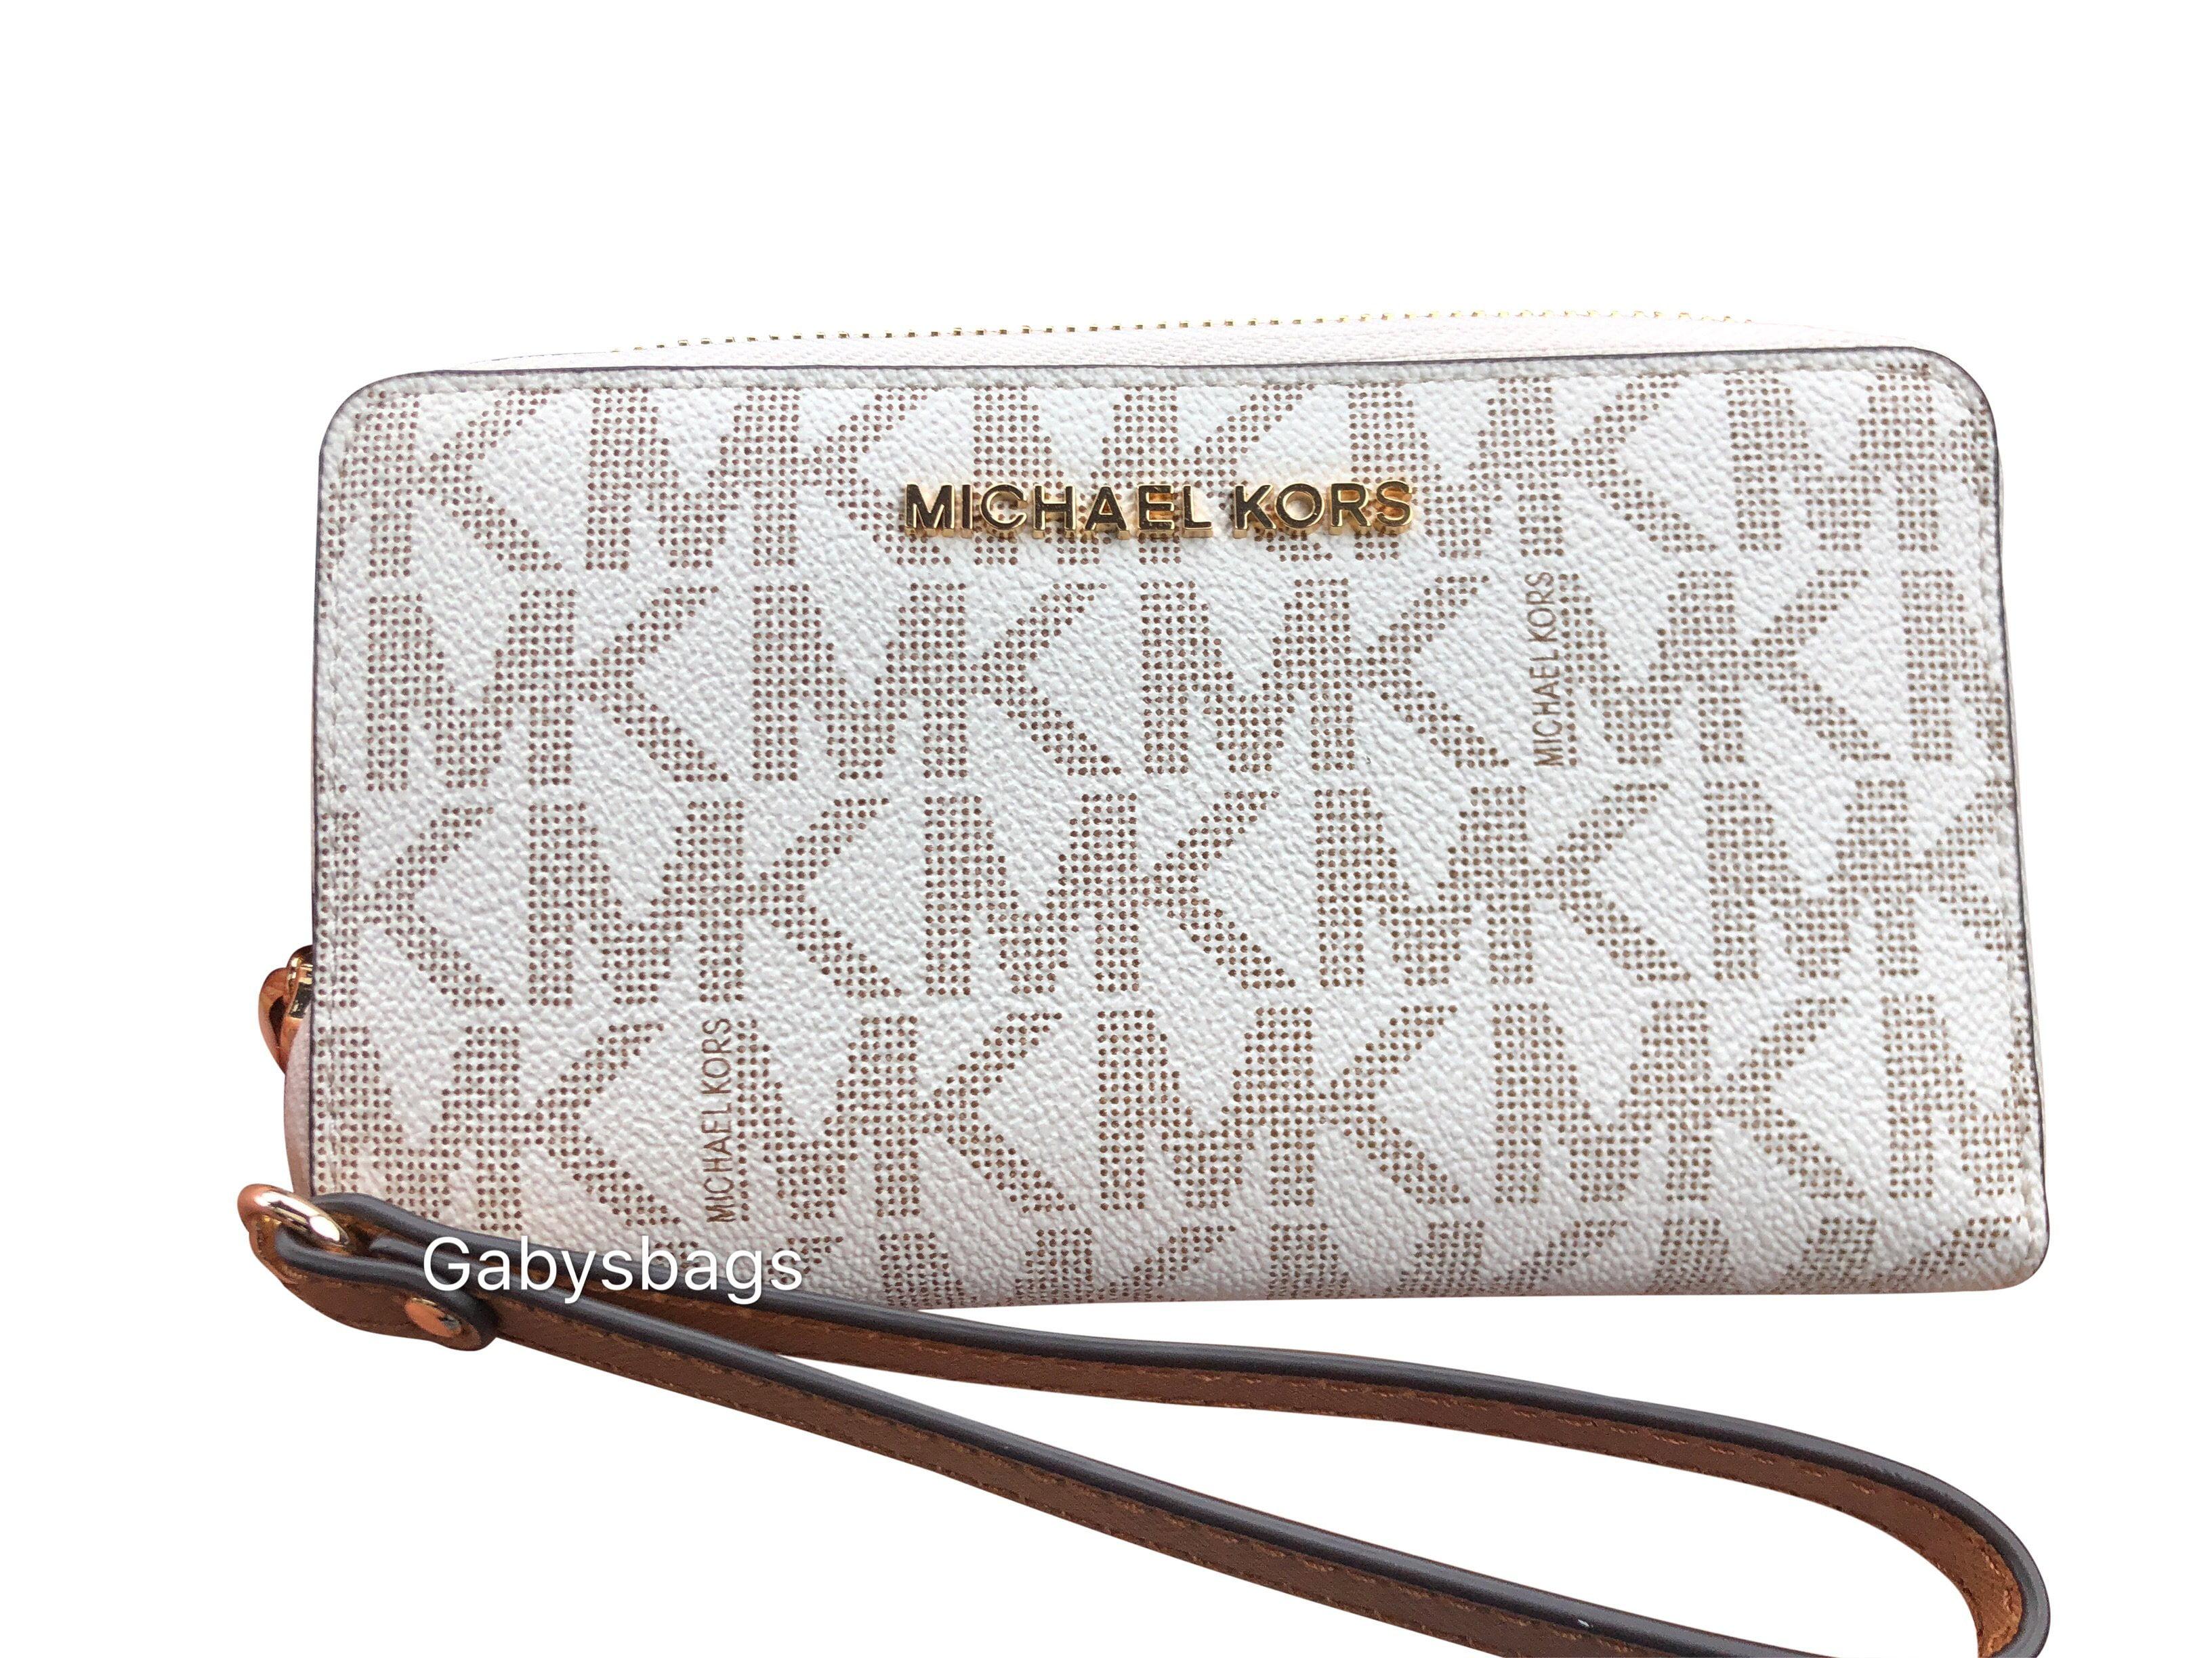 michael kors michael kors jet set phone wristlet wallet vanilla mk rh walmart com